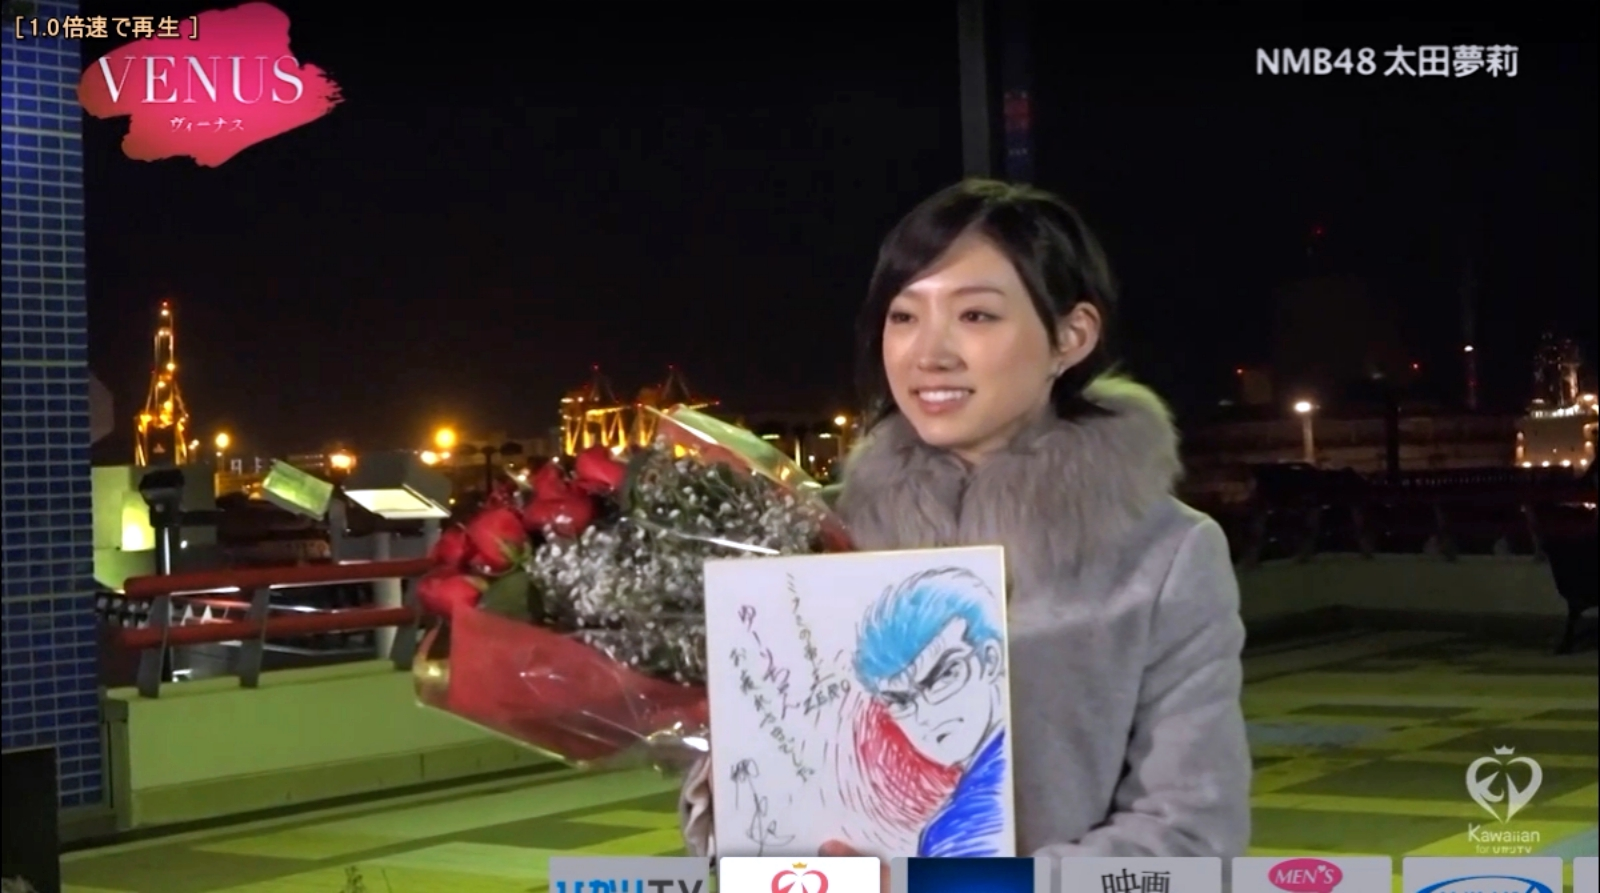 【NMB48】アイドルファイル「Venus」太田夢莉・後編の画像。ミナミの帝王ZERO撮影現場とお買い物に密着